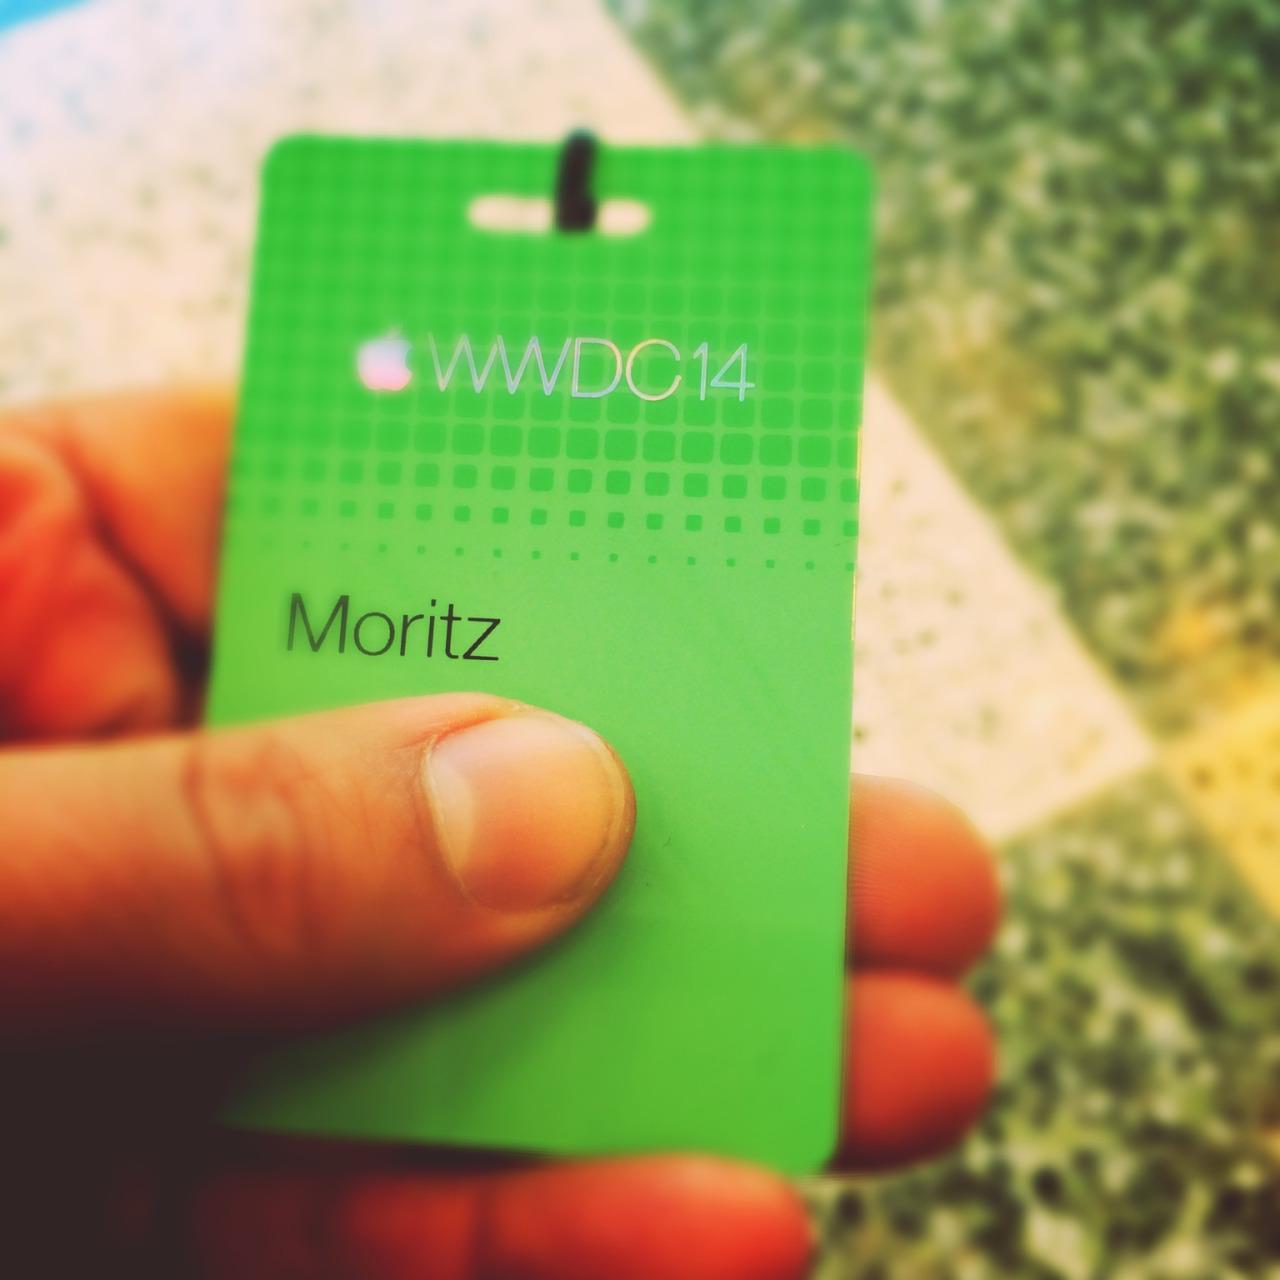 WWDC 2014 - badge